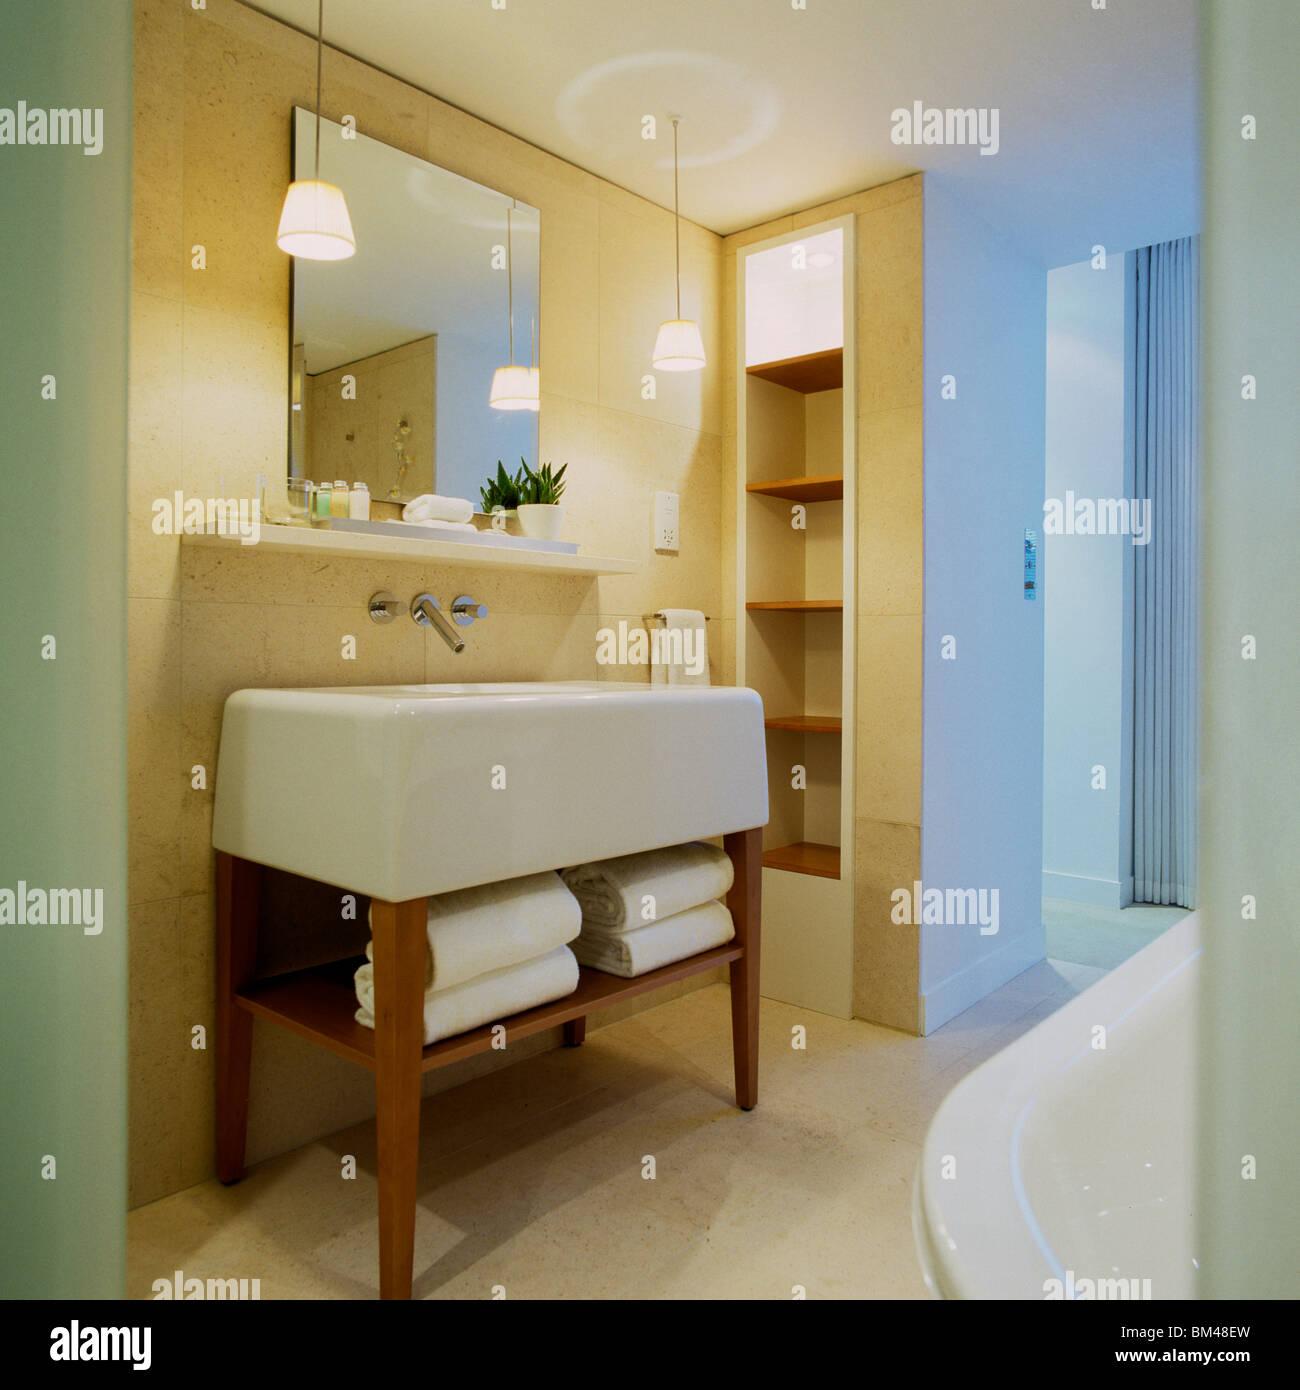 Hotel Bathroom Designed By Philippe Starck, St Martins Lane Hotel, London